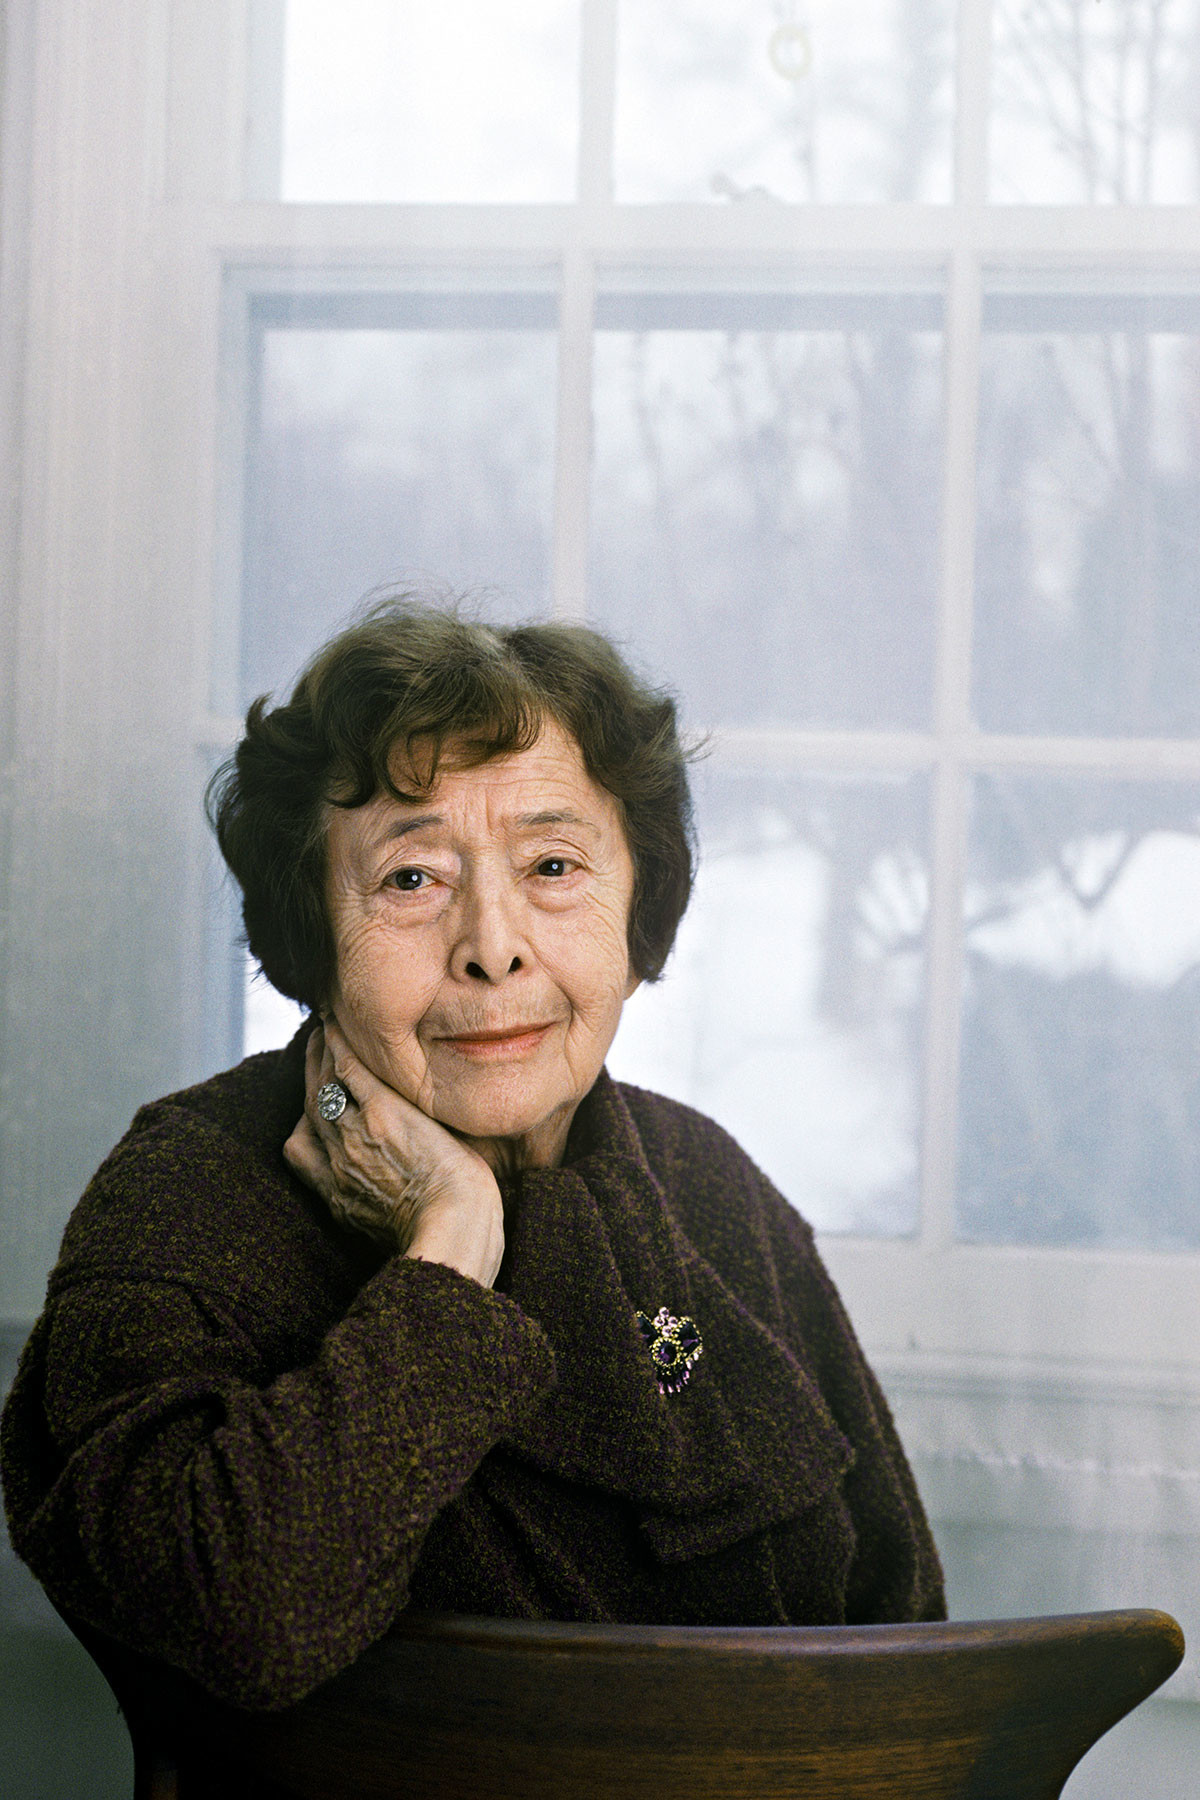 Berberova's suberb storytelling skill manifested itself in her memoirs.